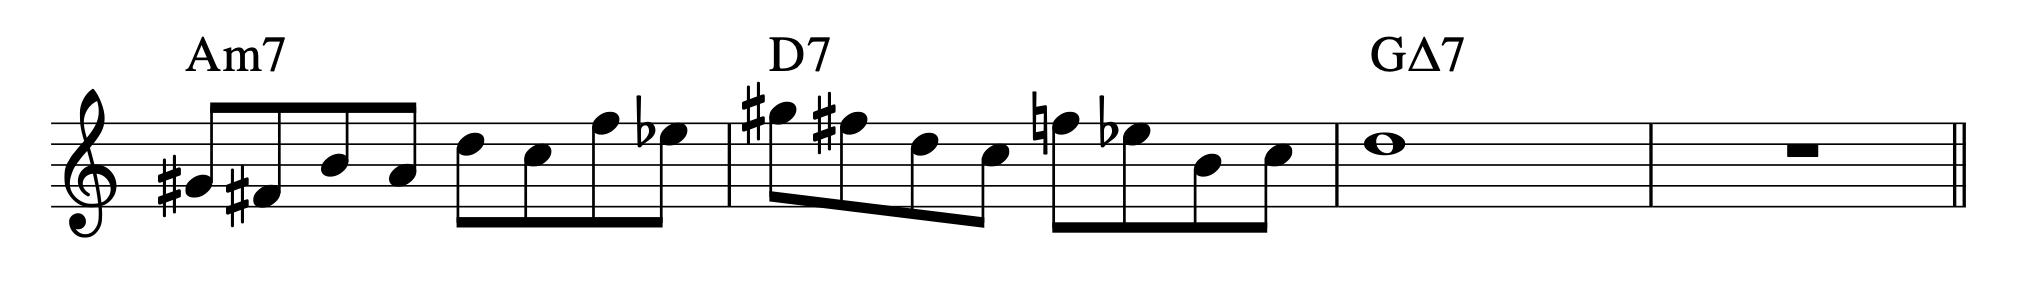 diminish-phrase-5